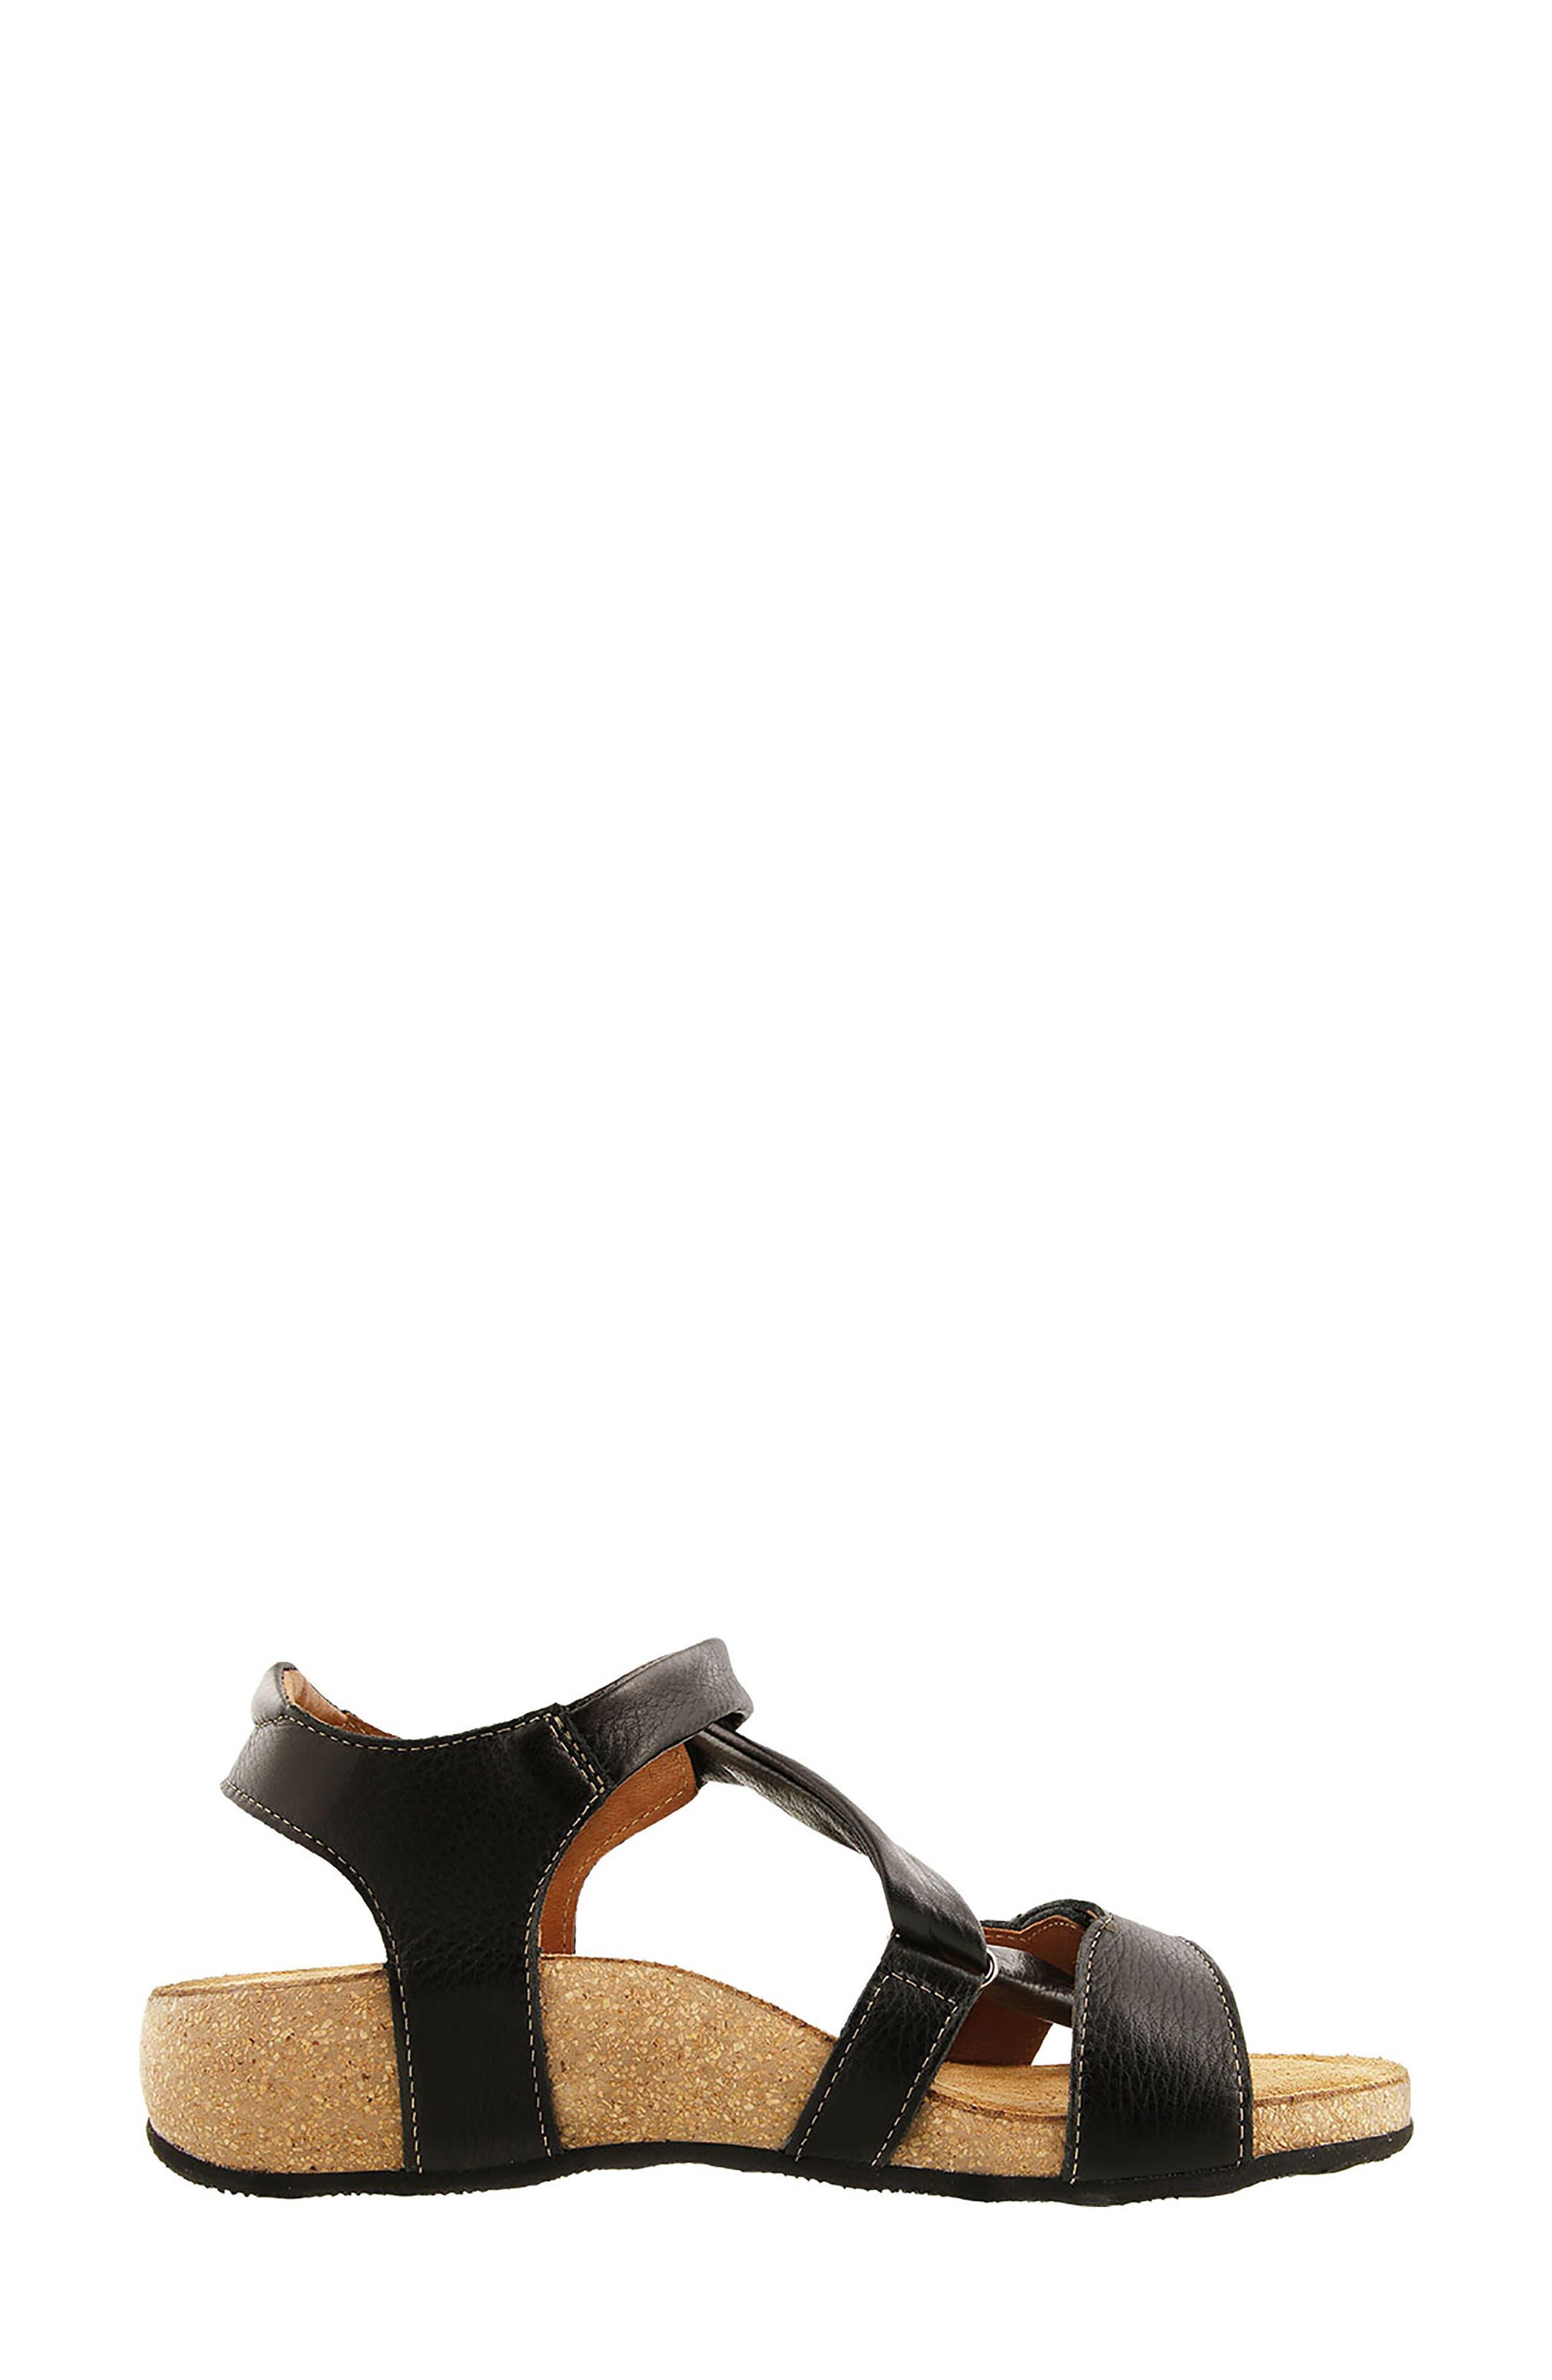 Universe Sandal,                             Alternate thumbnail 3, color,                             BLACK LEATHER